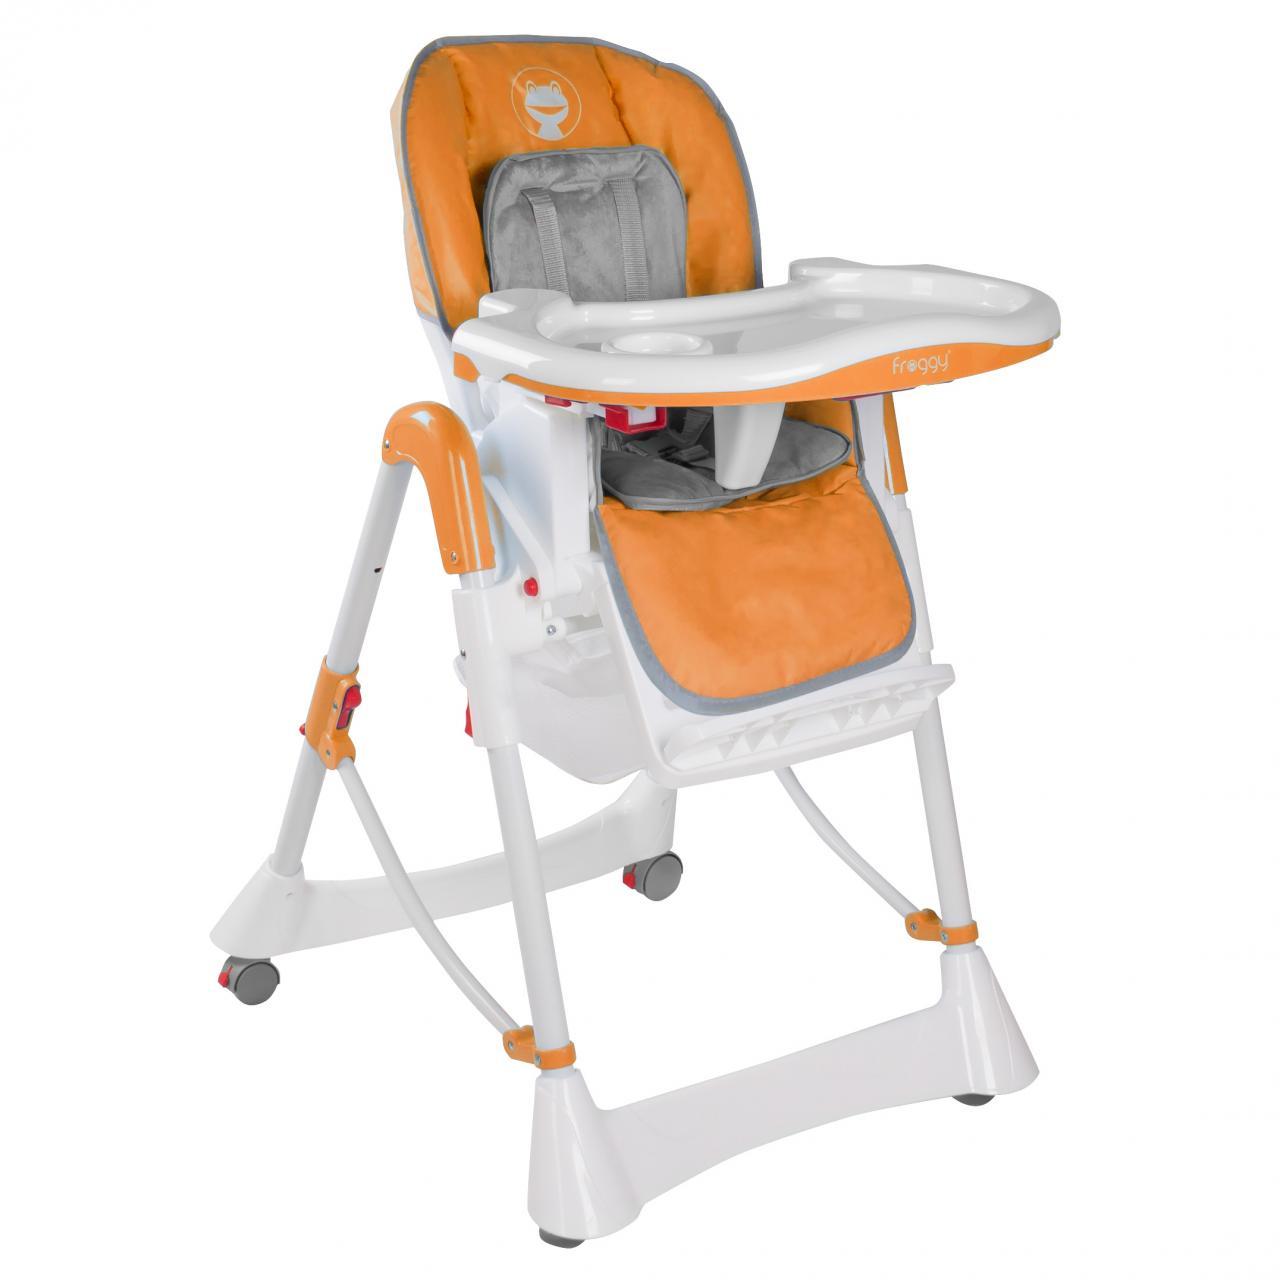 Froggy-Baby-Kinder-Hochstuhl-Babystuhl-Kinderstuhl-Treppenhochstuhl-klappbar